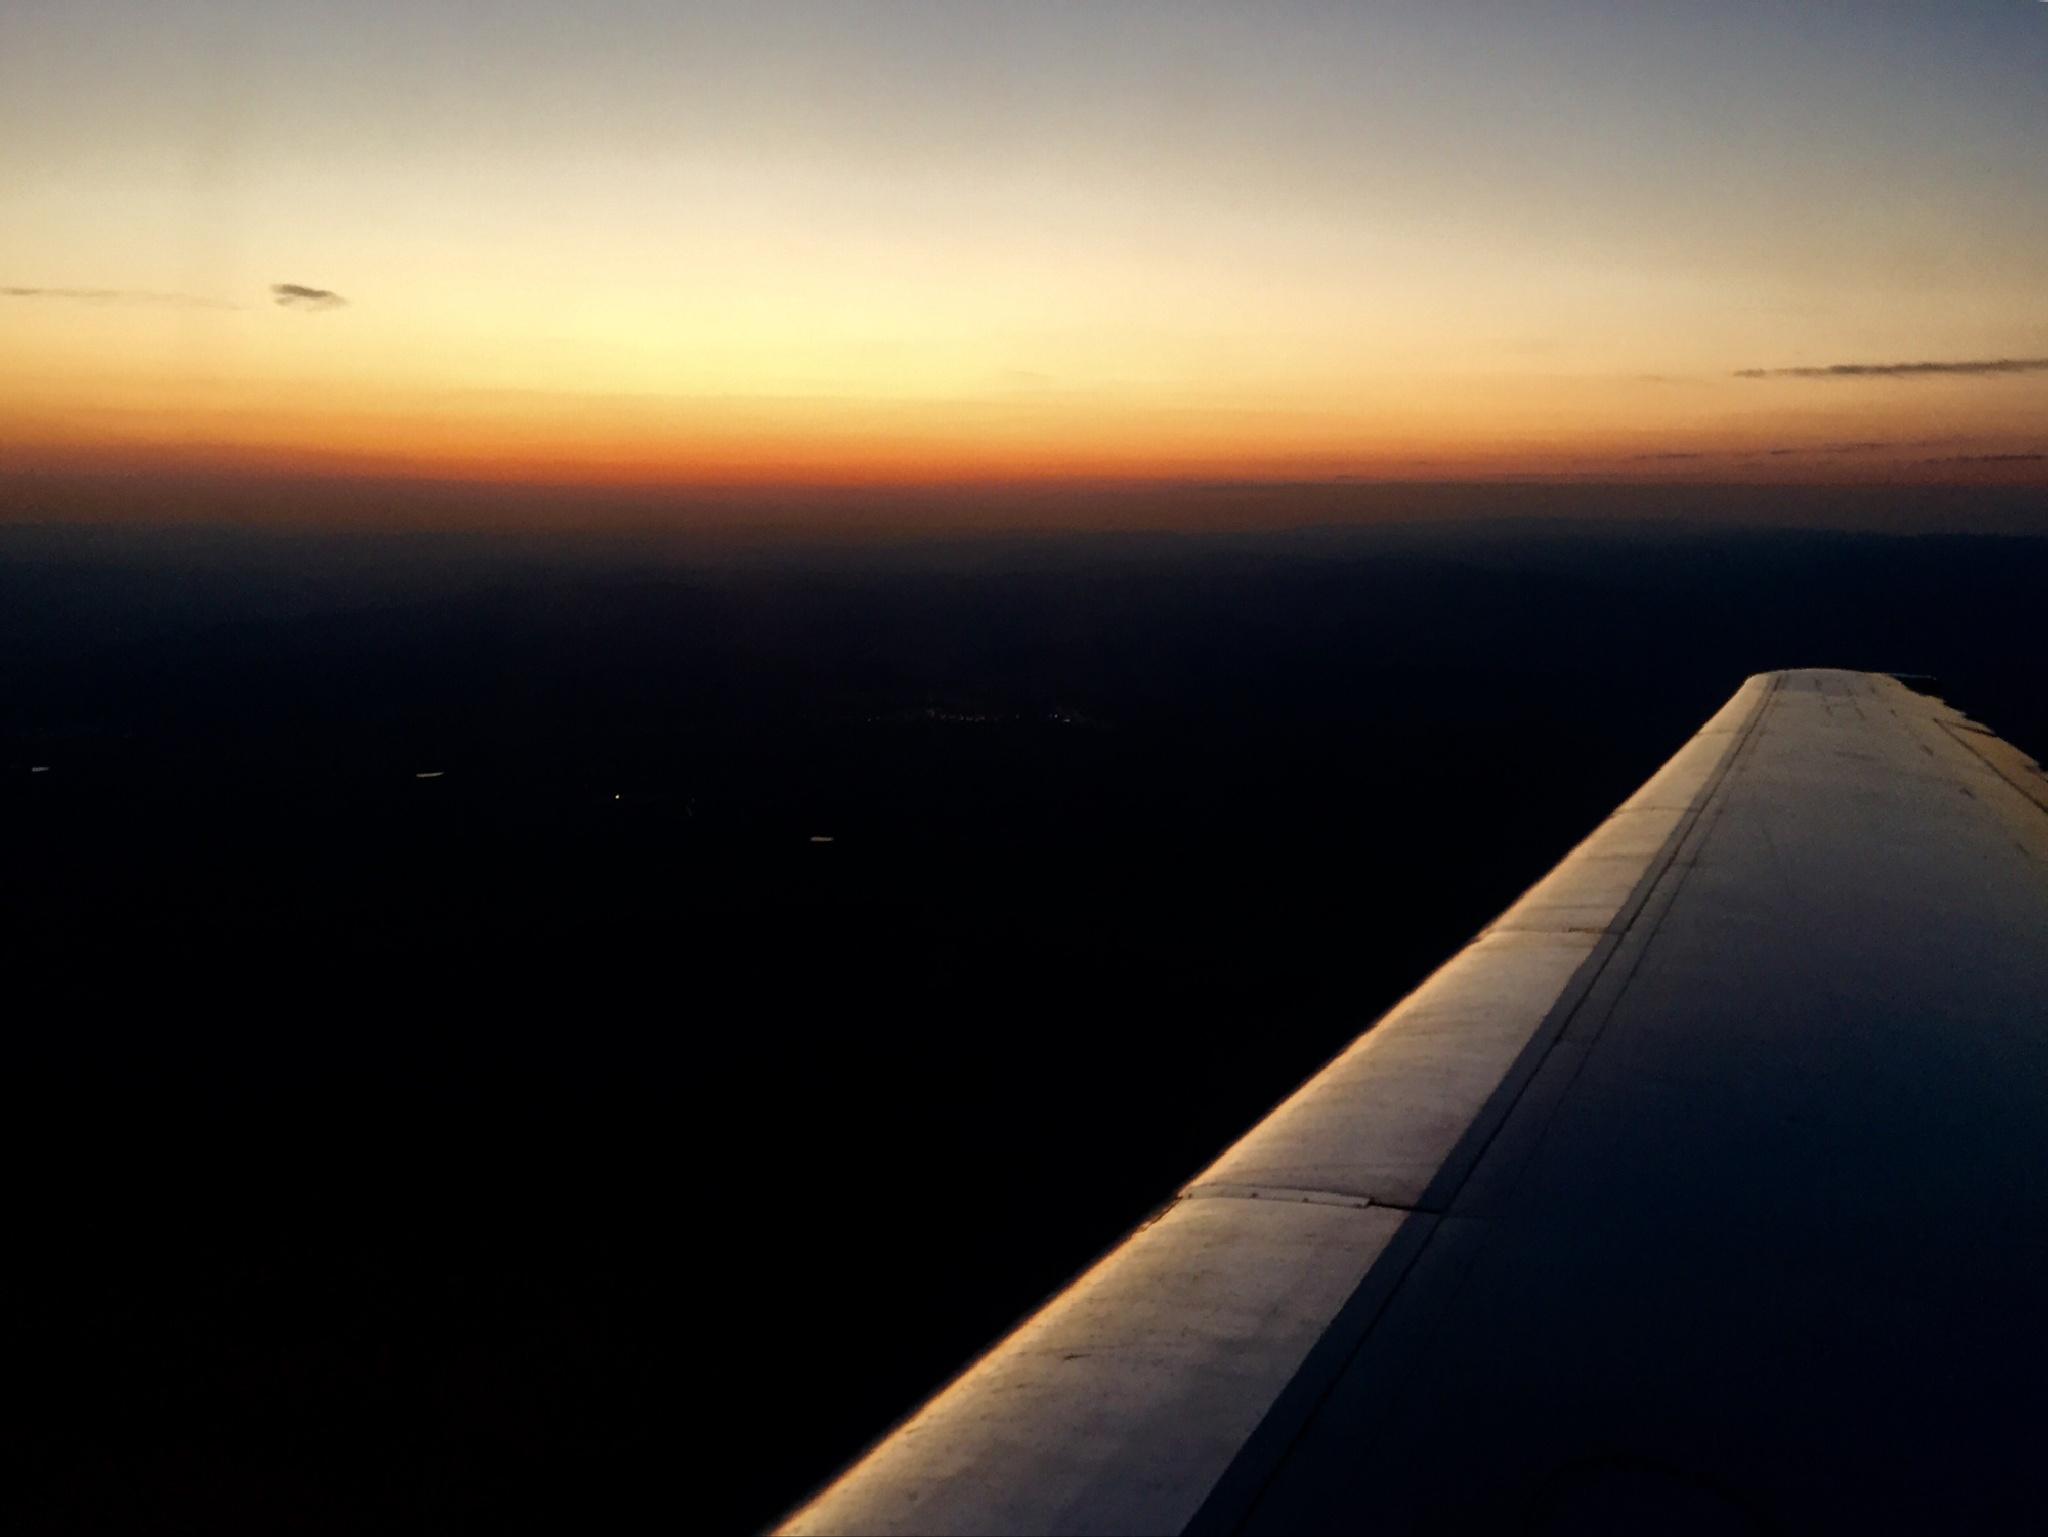 Volando by jestevelidon